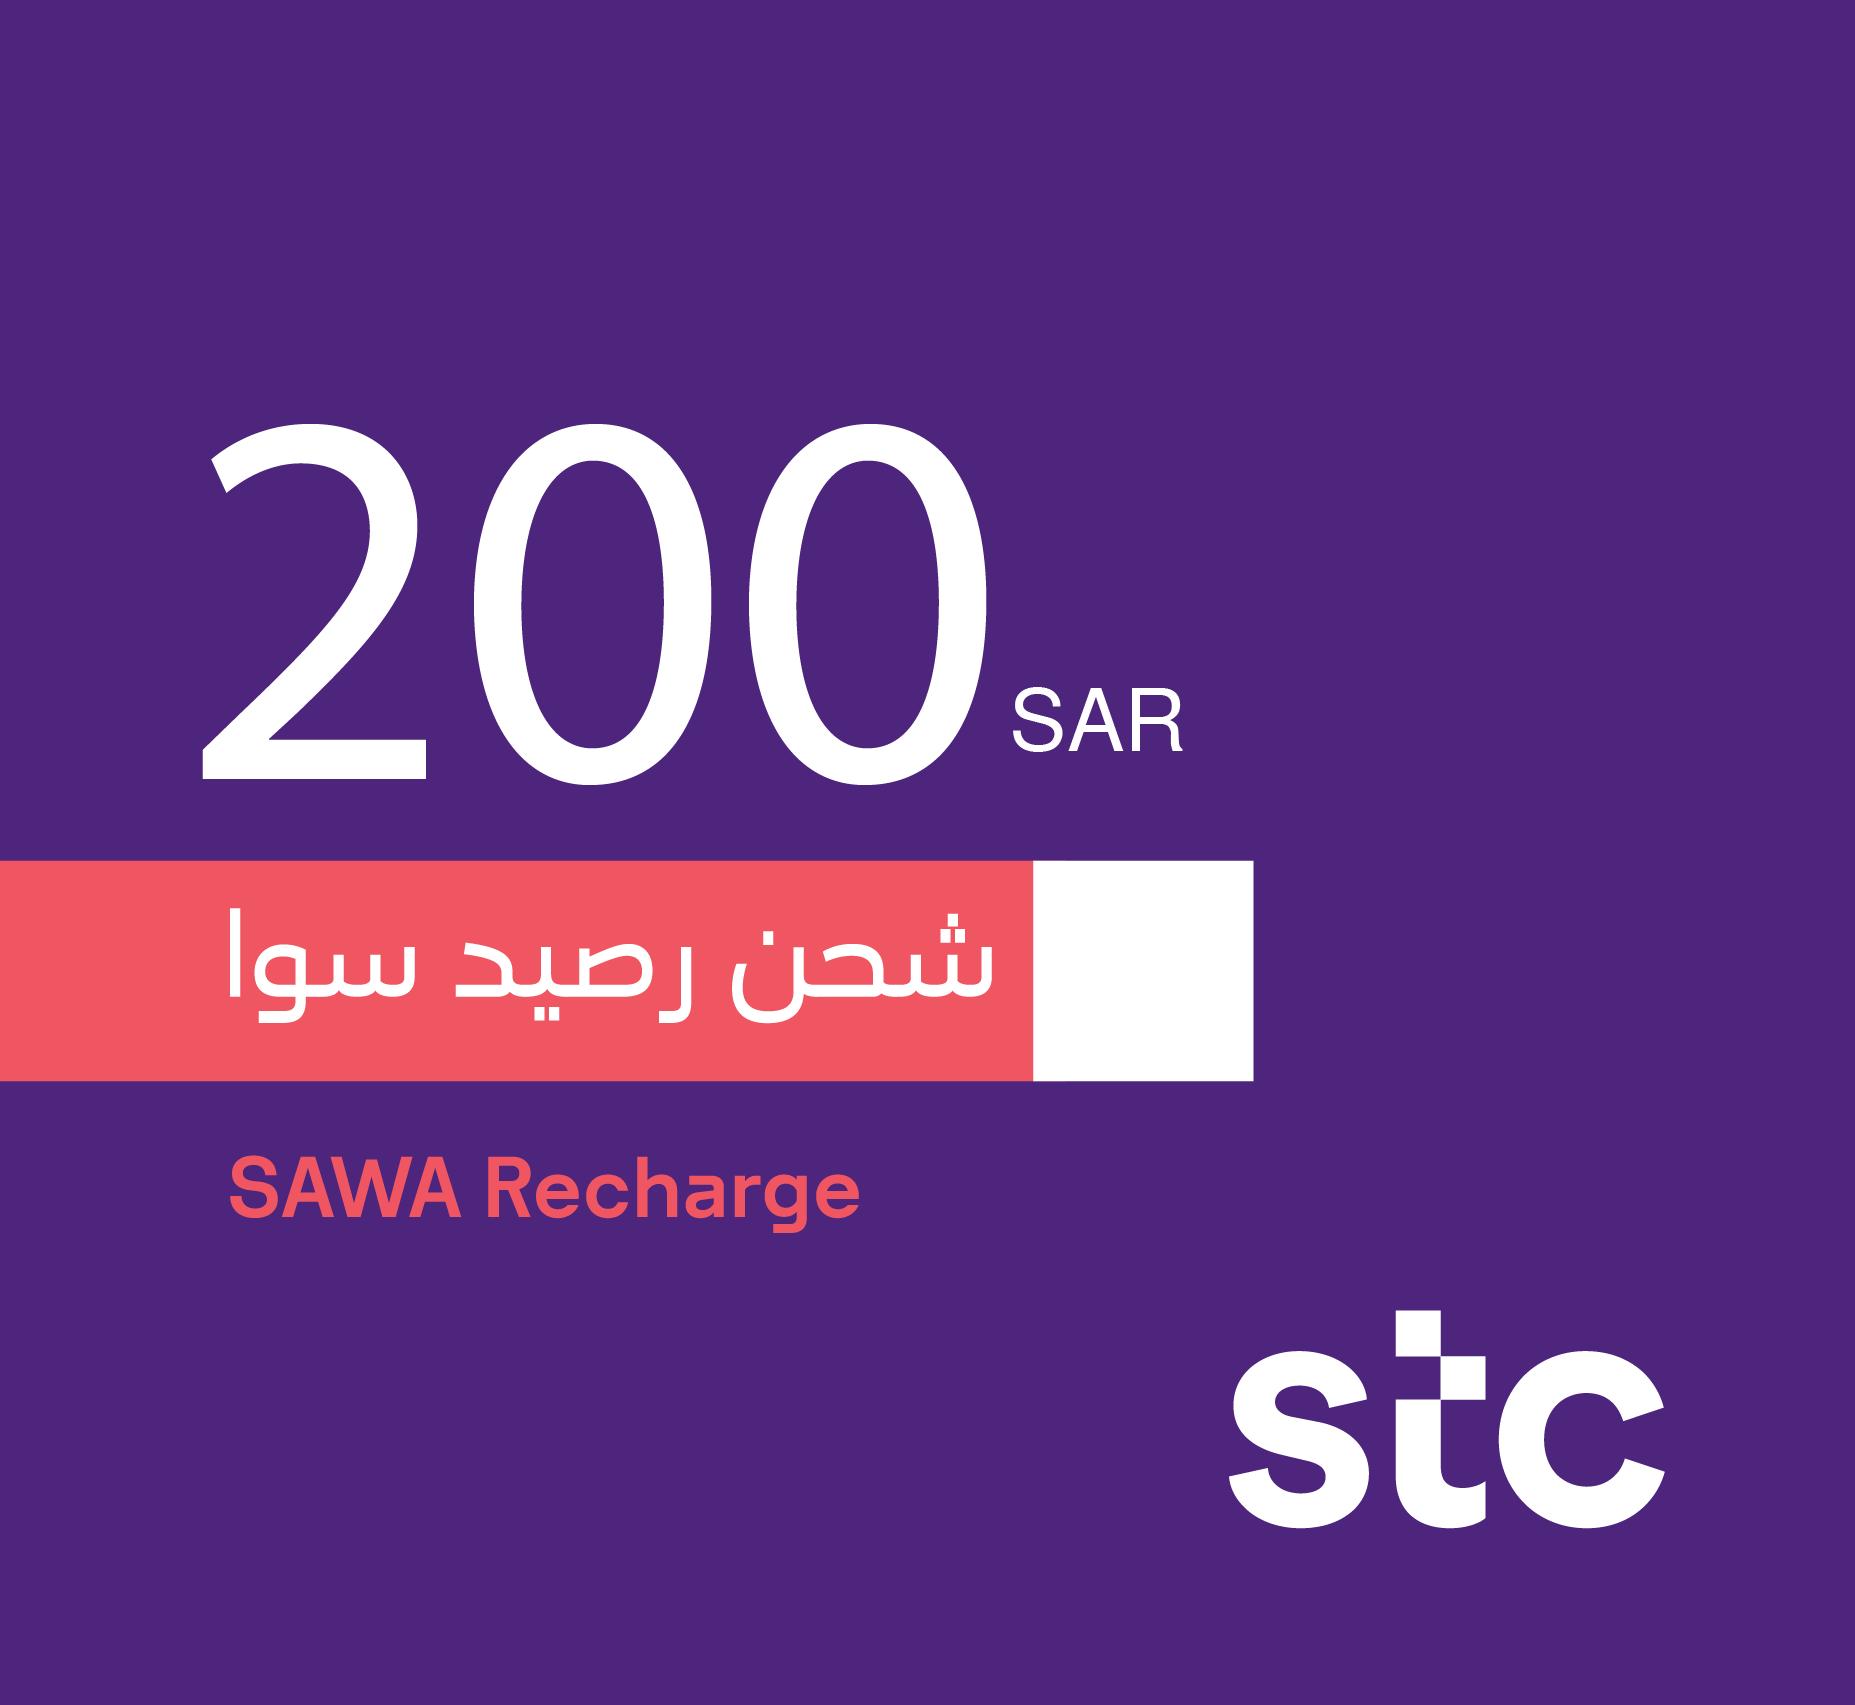 Sawa Recharge Card SR 200